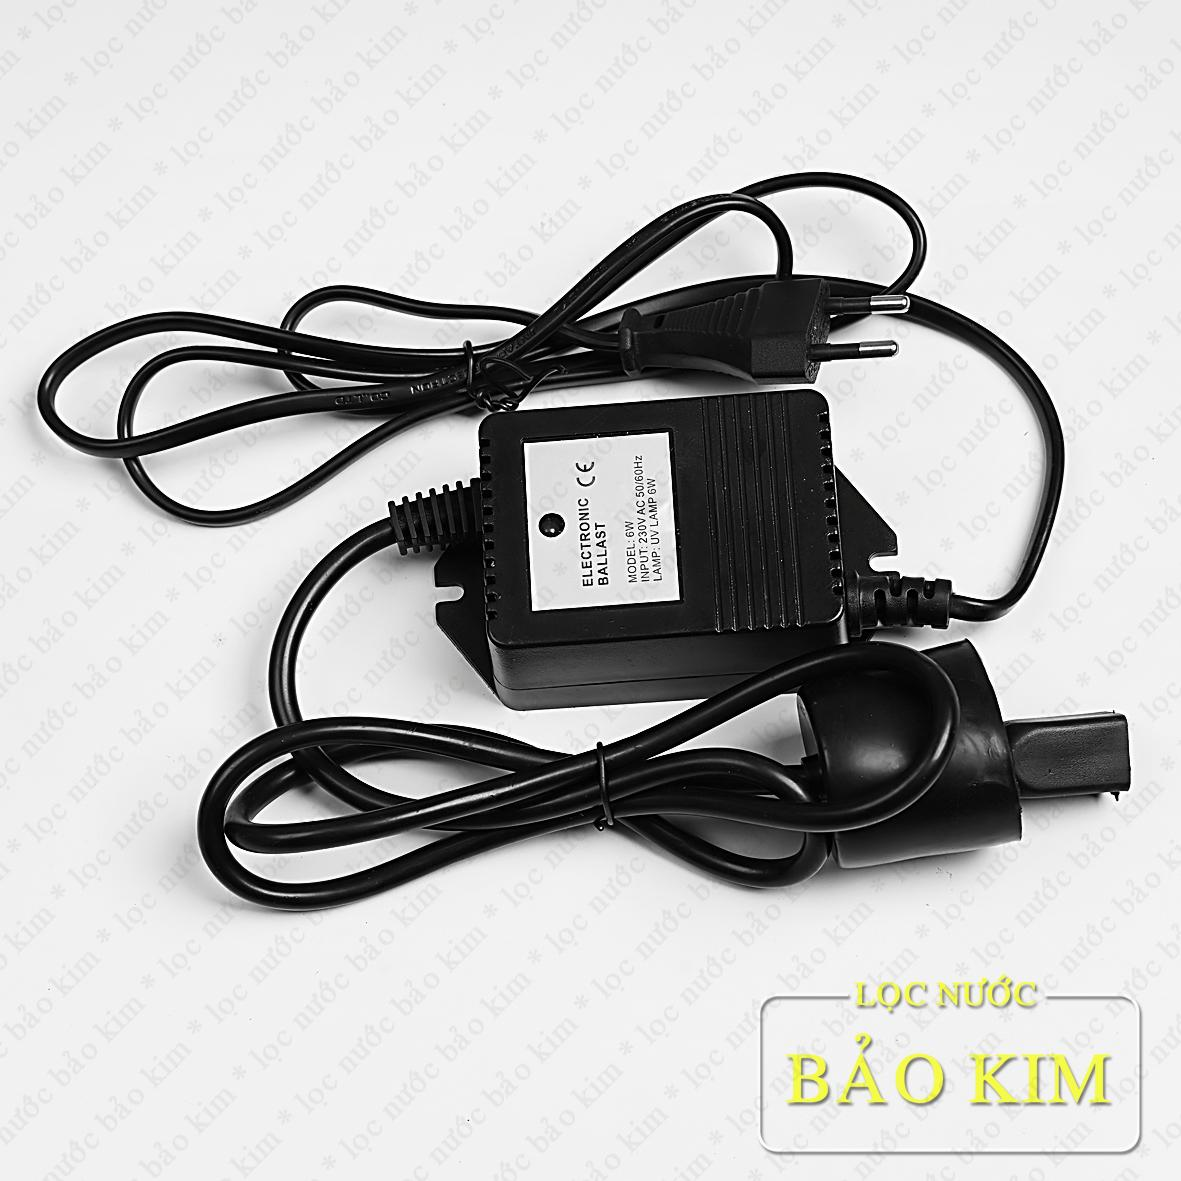 Bảng giá Adaptor - Ballast biến áp chuyển nguồn đèn cực tím UV 6W - 4 chấu Điện máy Pico